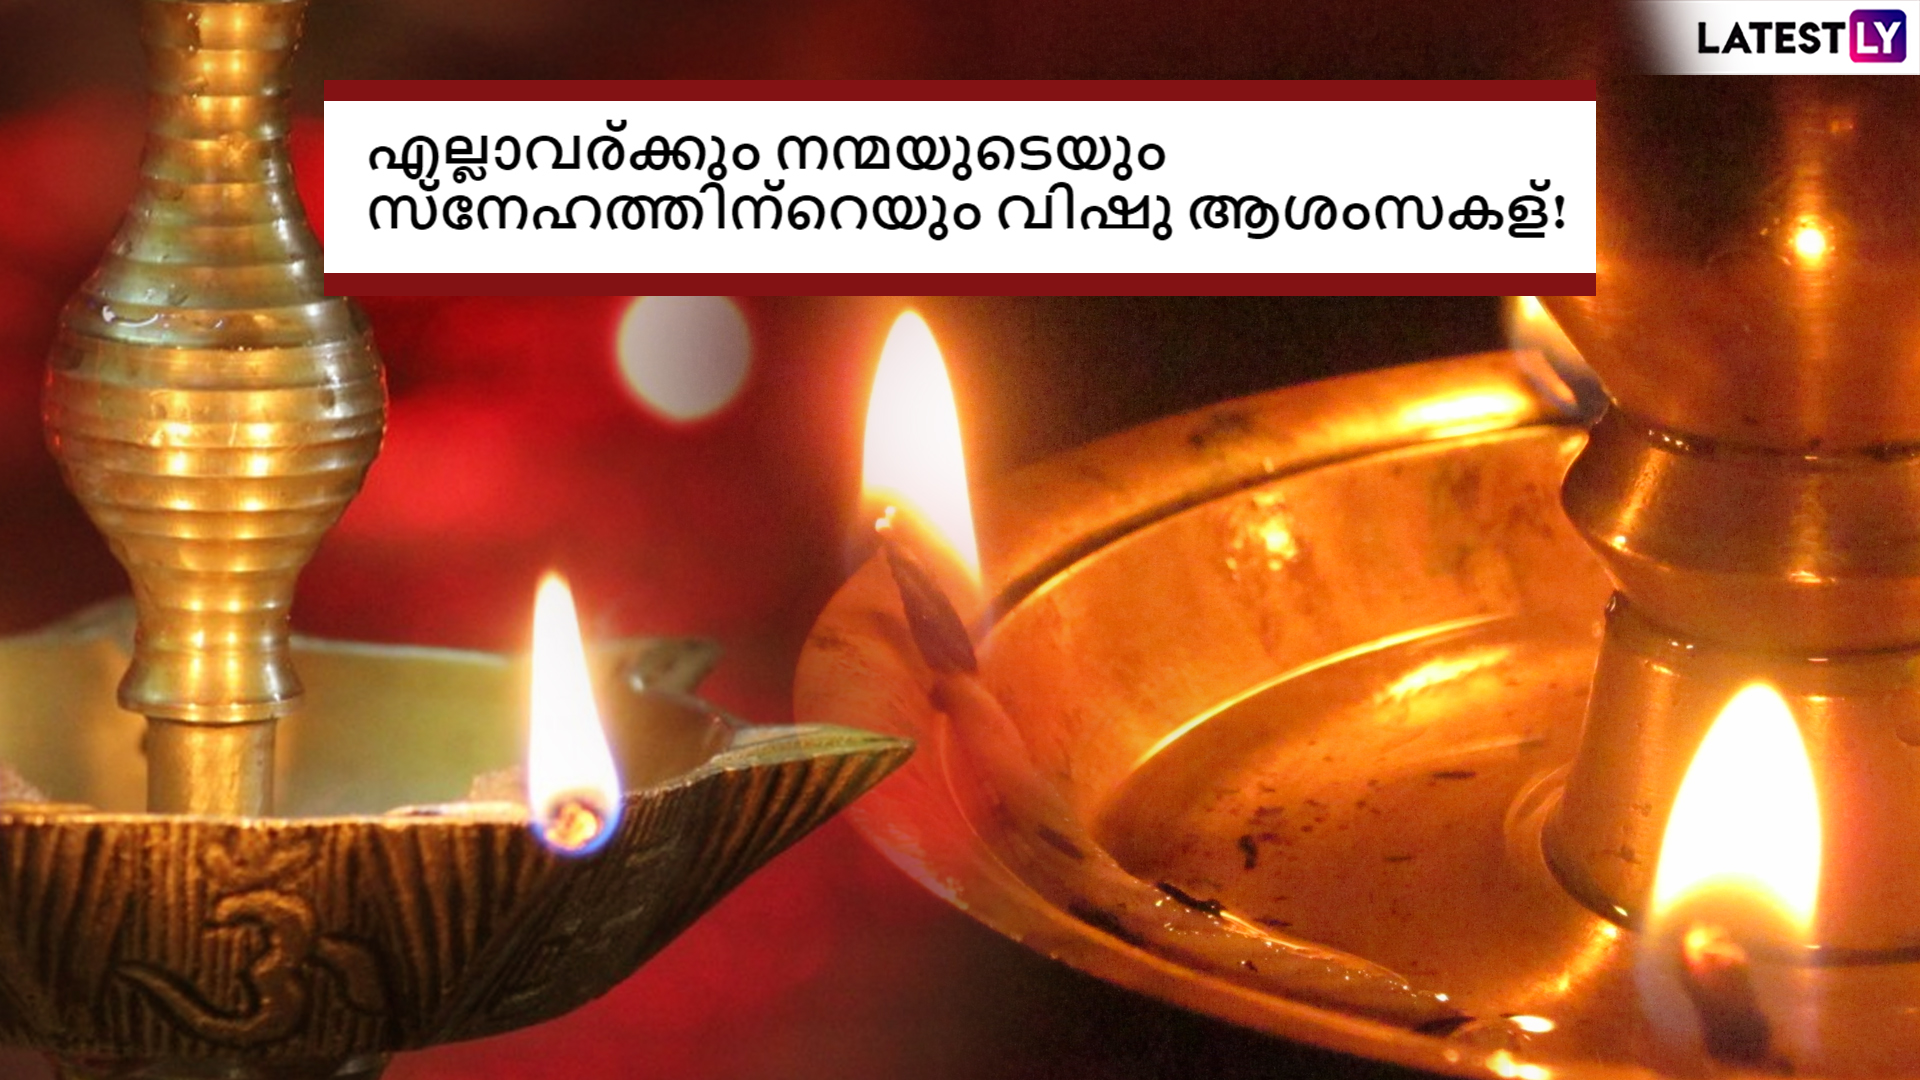 Happy Vishu 2019 Messages in Malayalam: Whatsapp Stickers